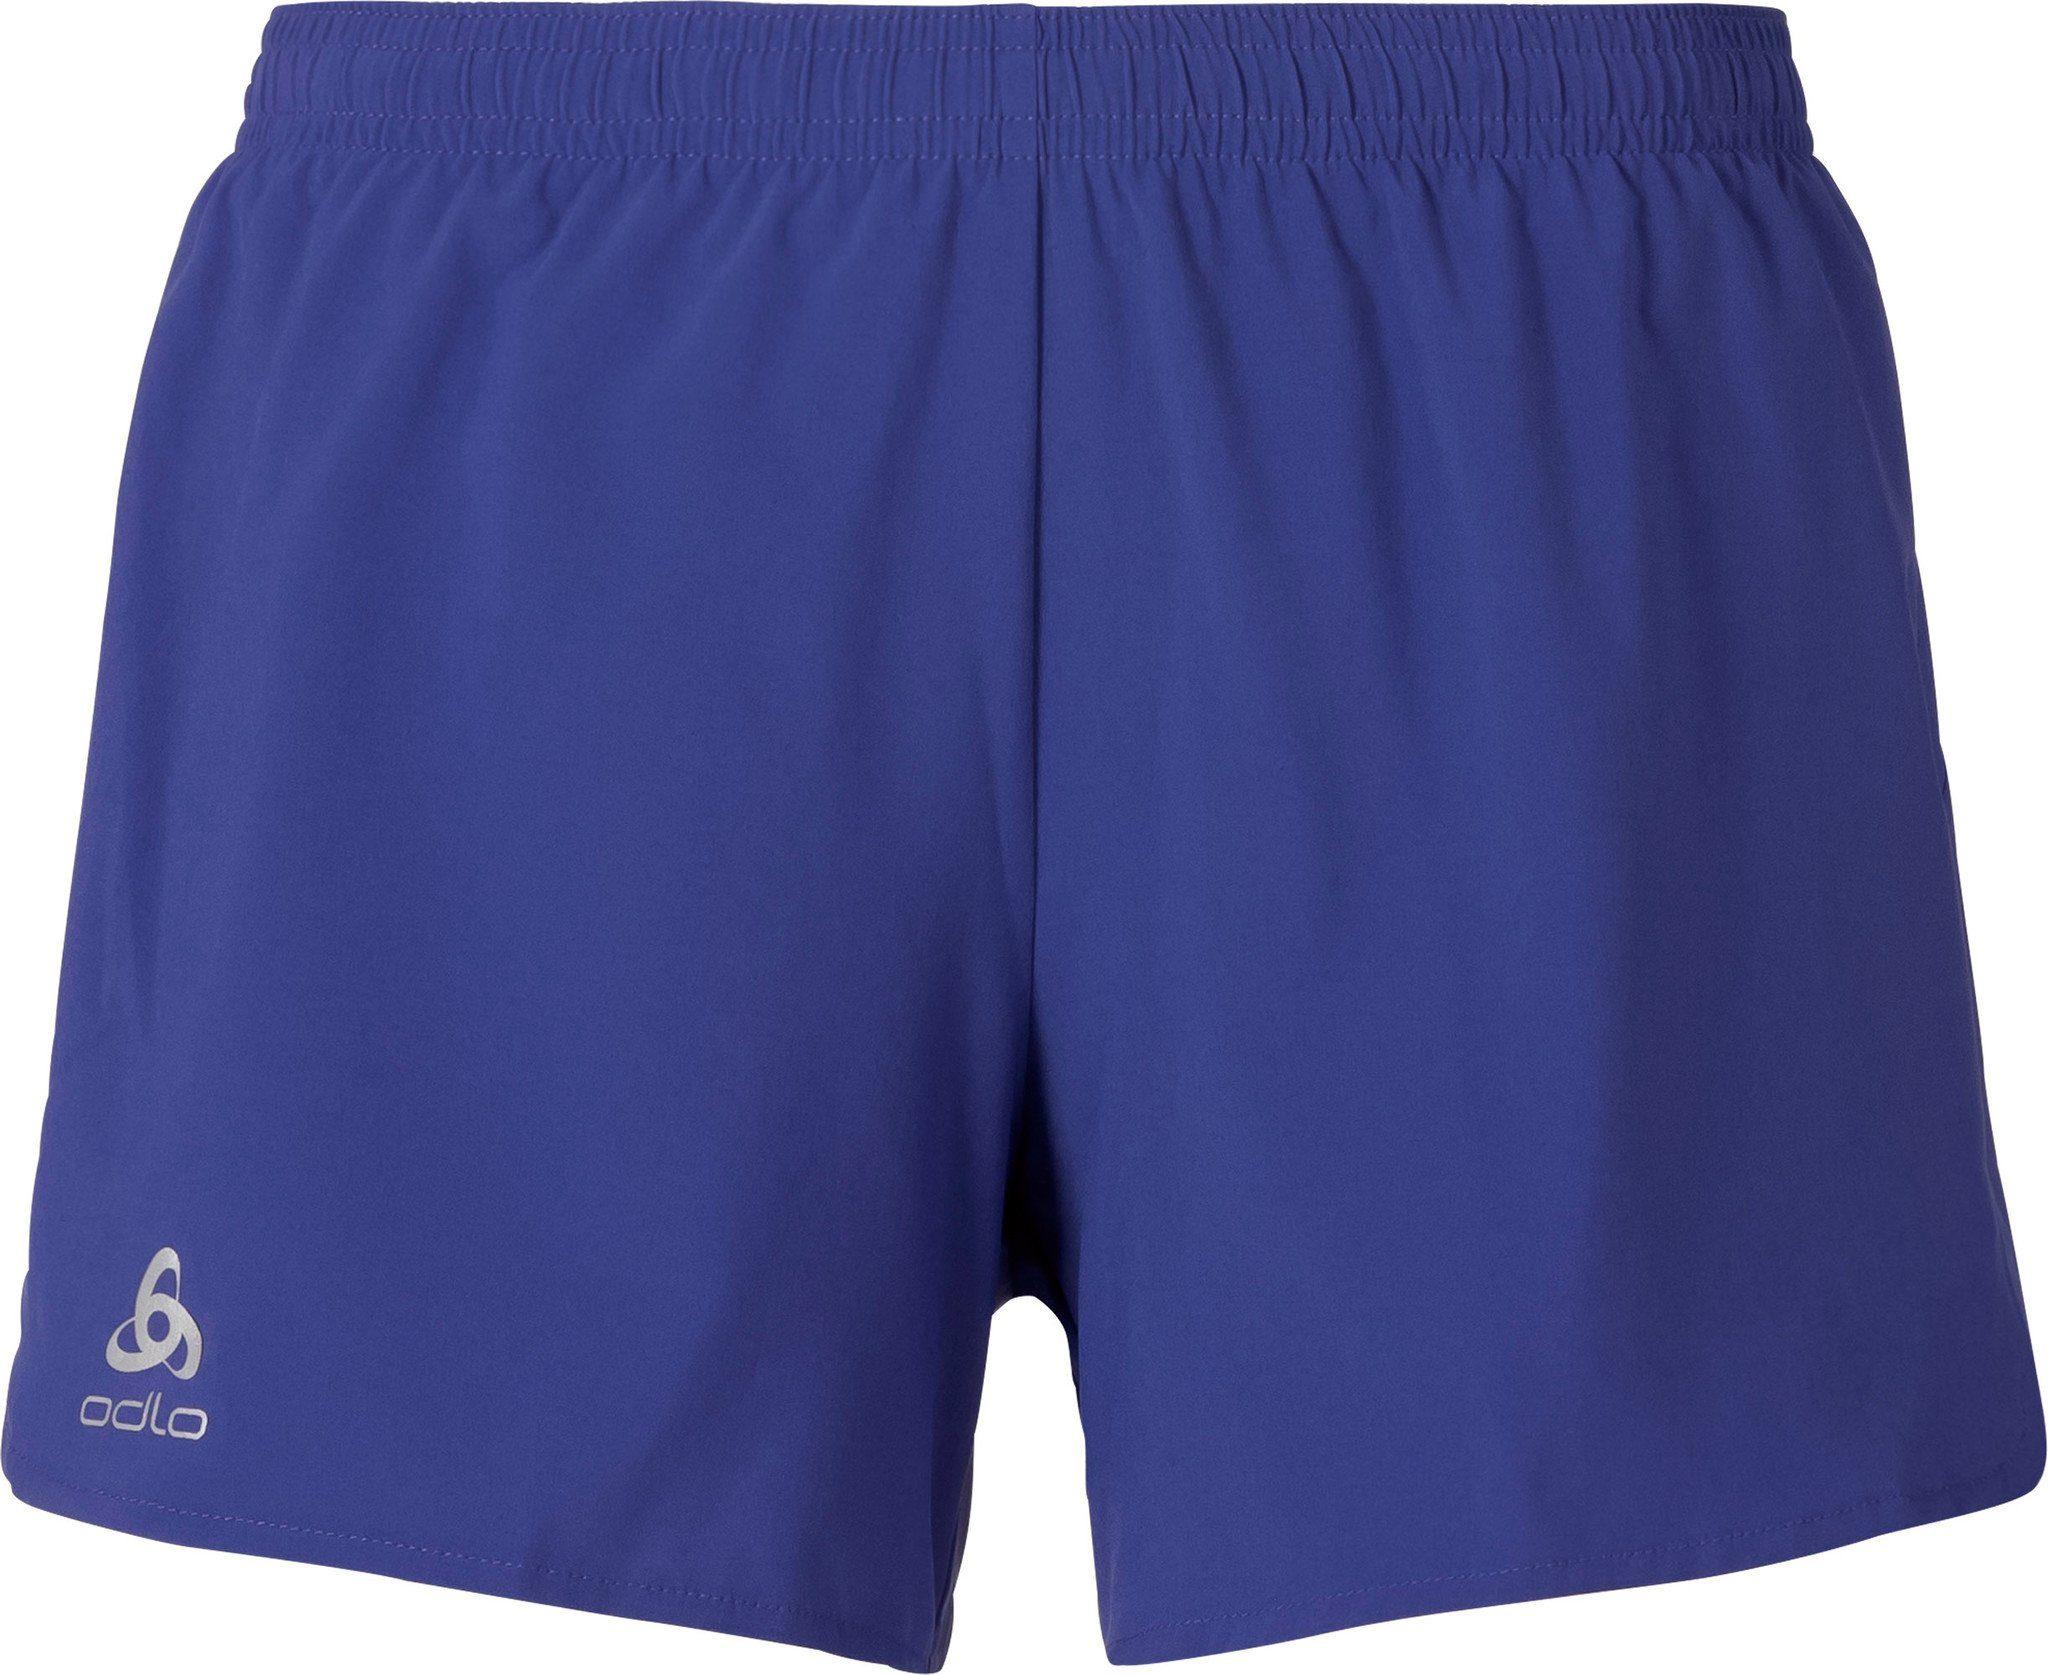 Odlo Hose »Swing Shorts Women«